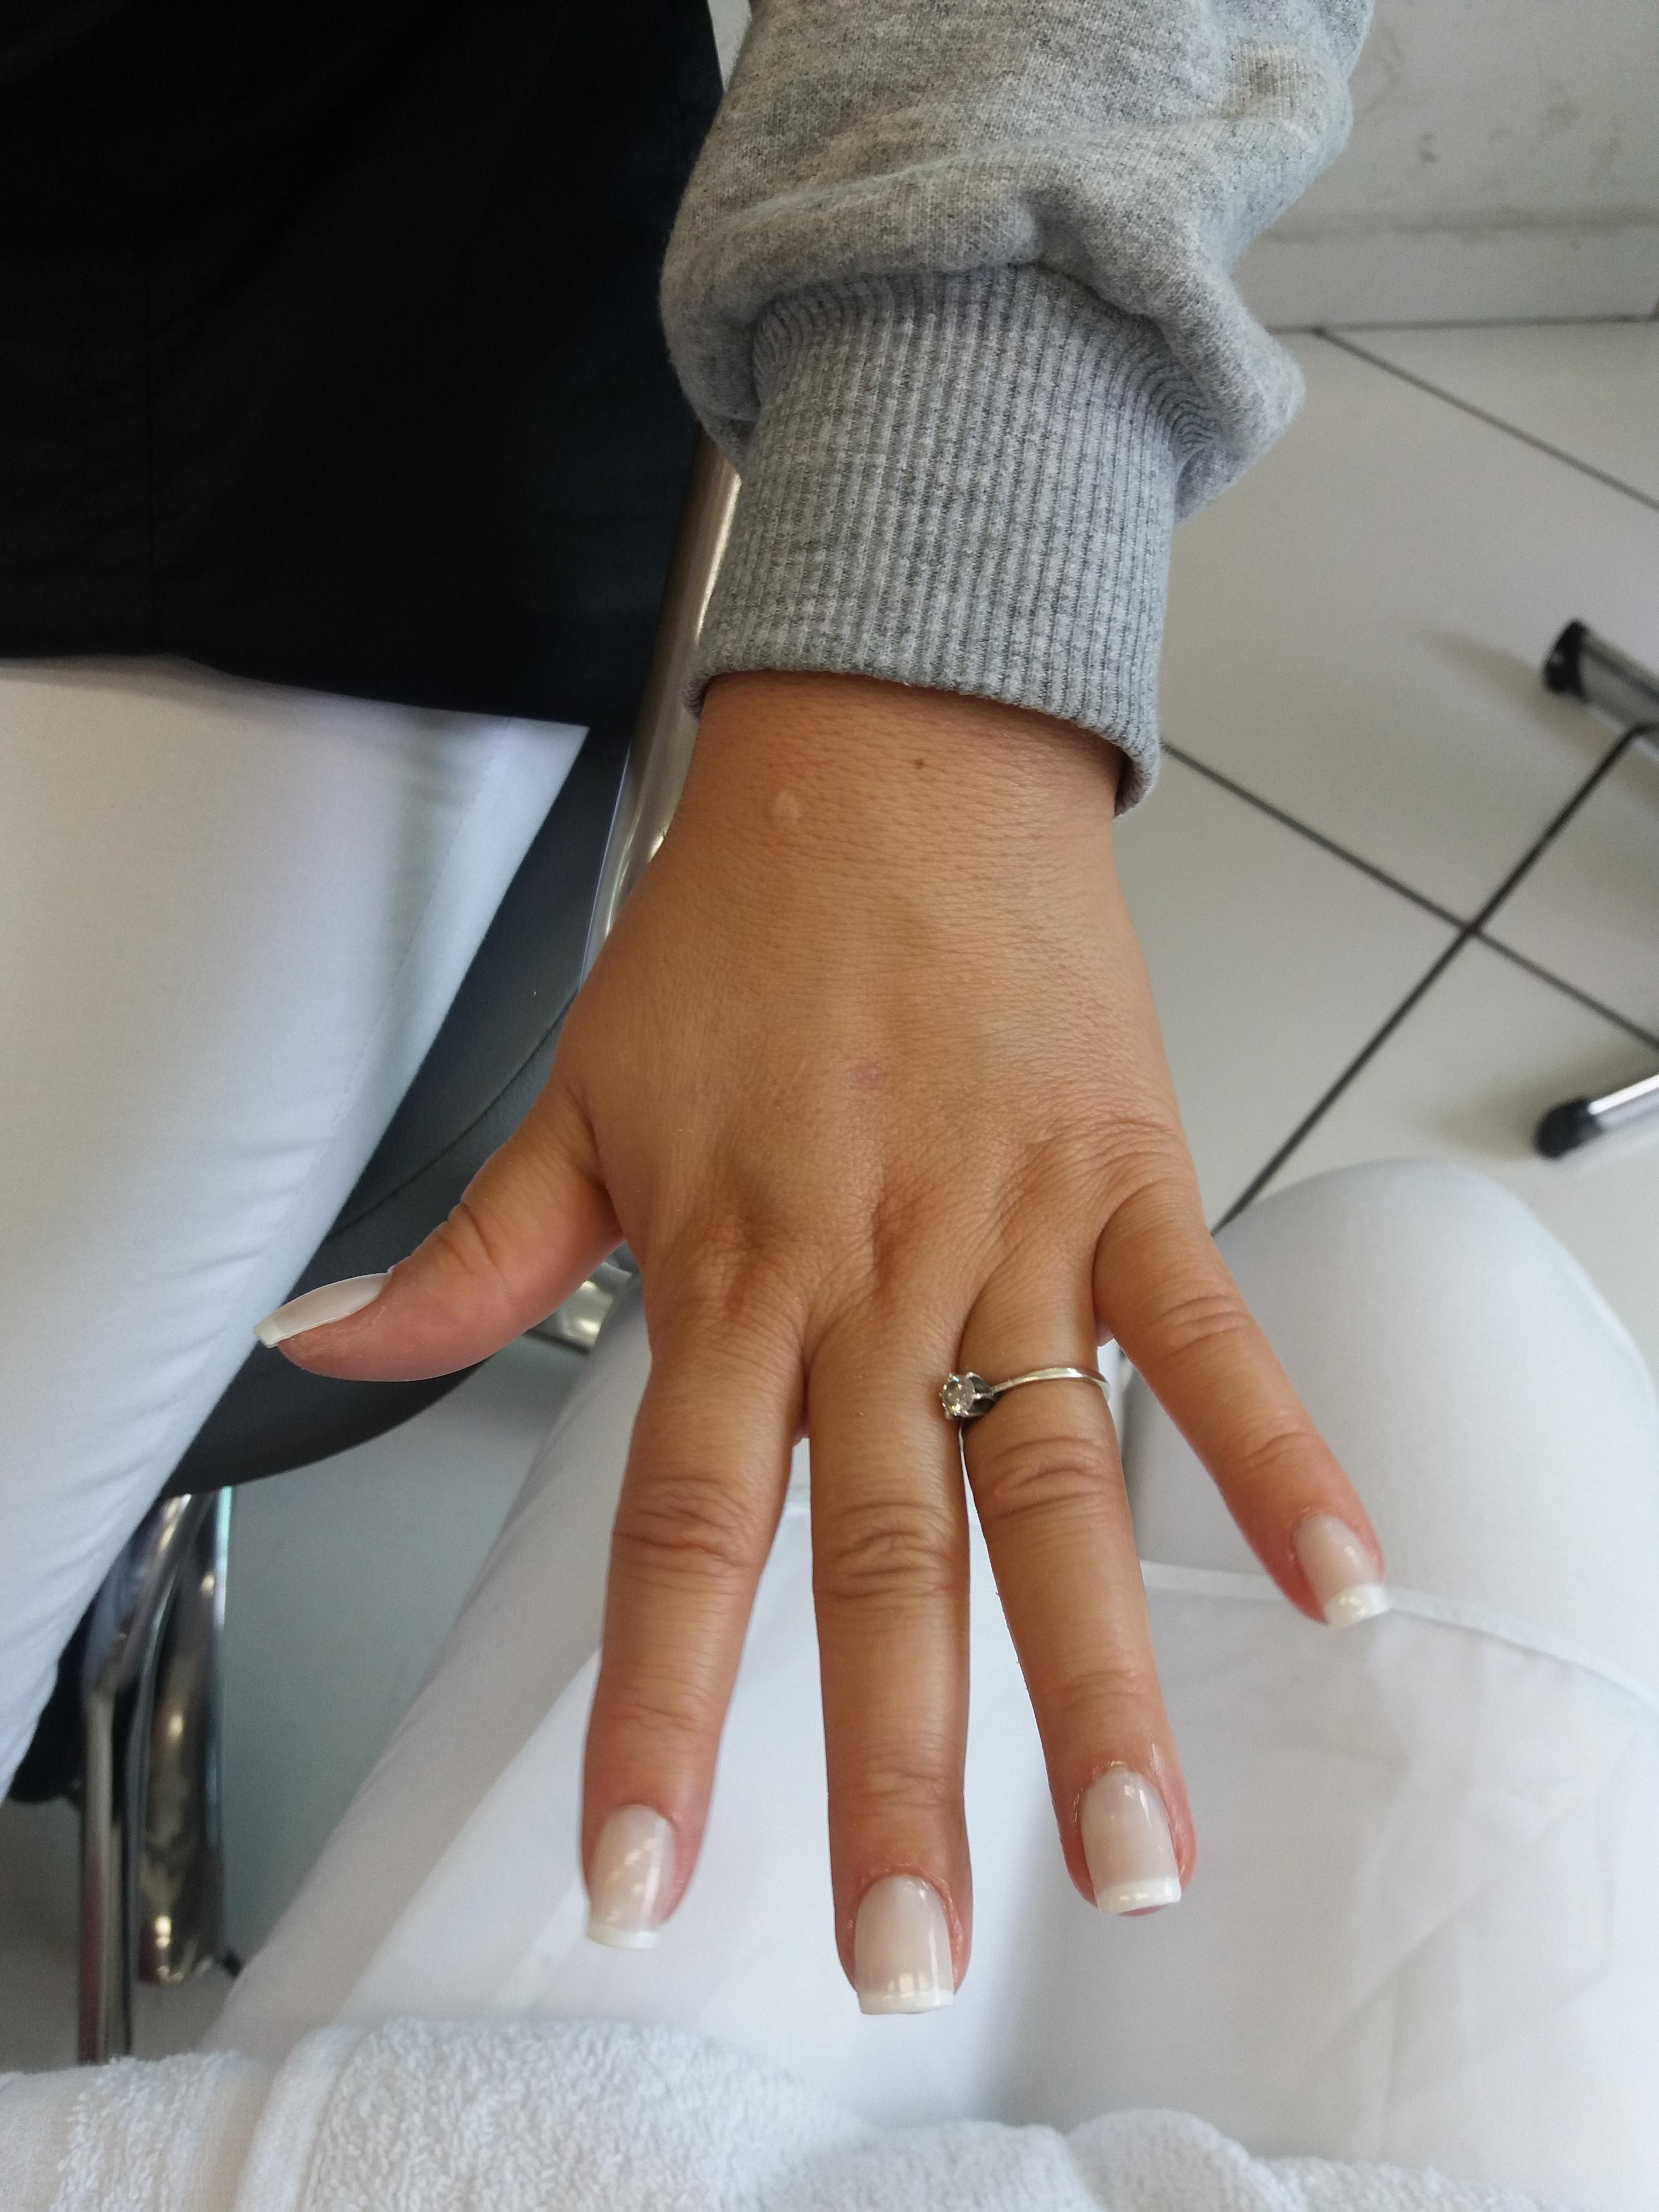 #francesinha #nails #manicureporamor  unha manicure e pedicure